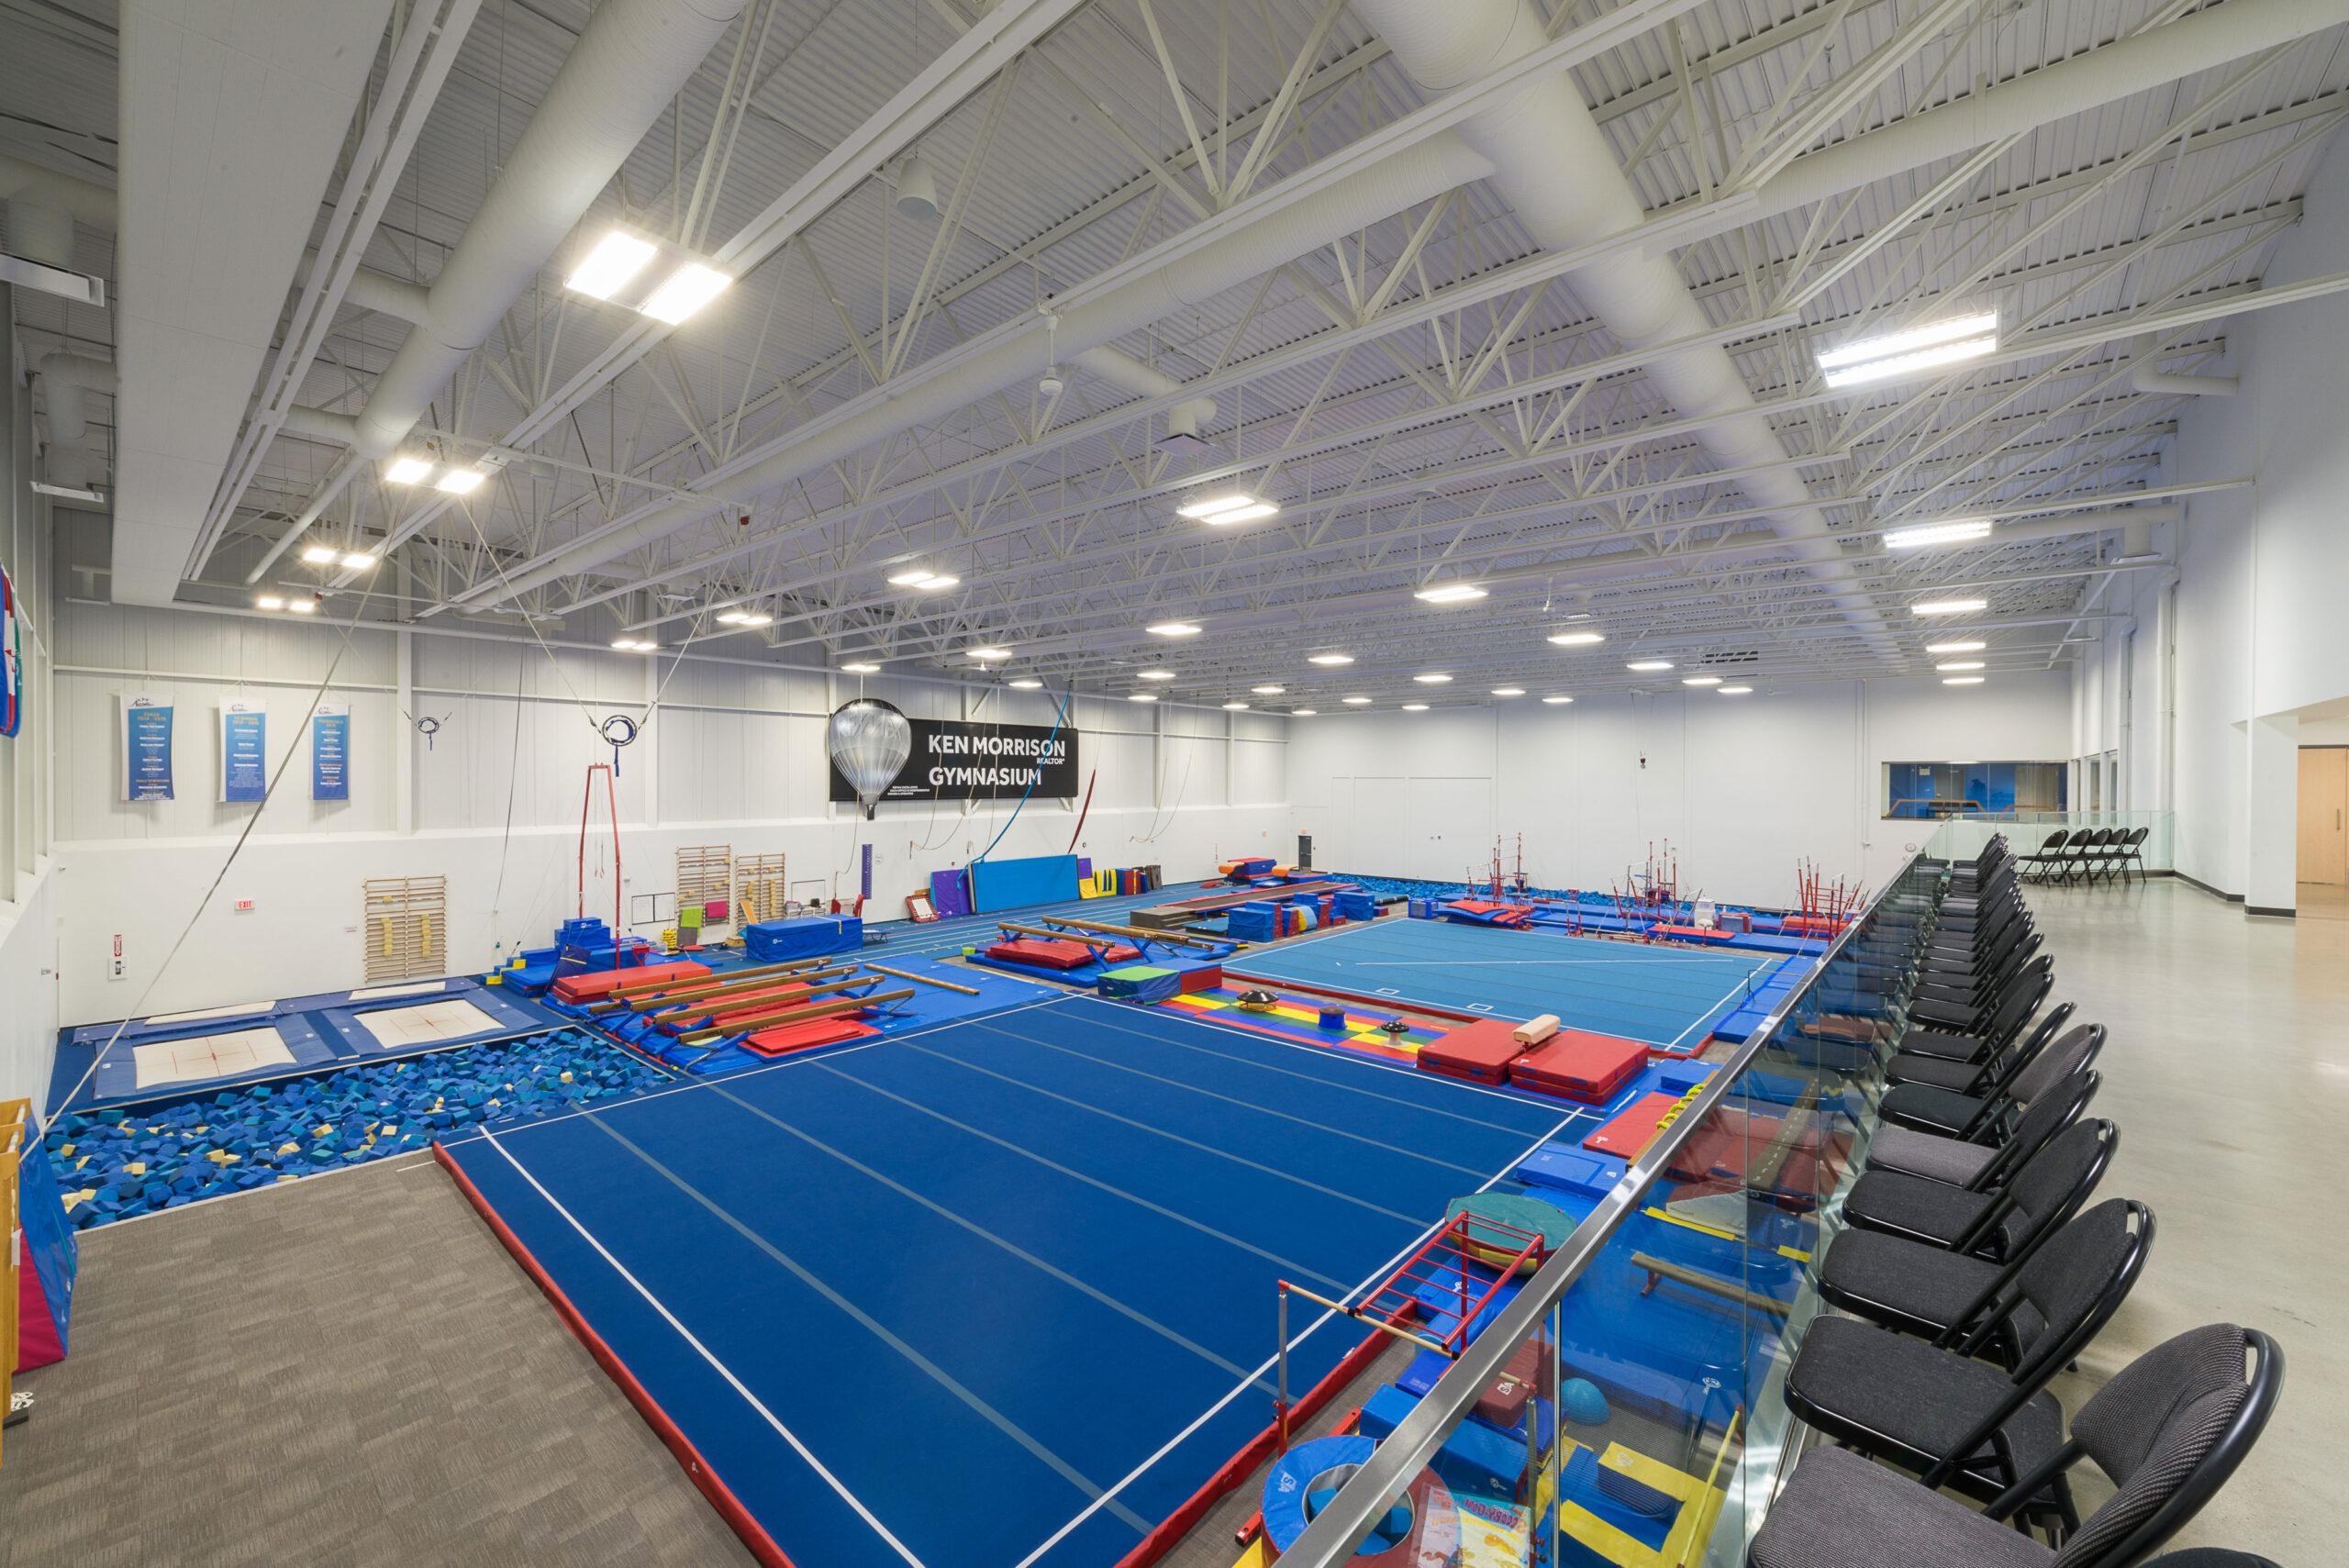 Border Paving Athletic Centre Spruce Grove Alberta